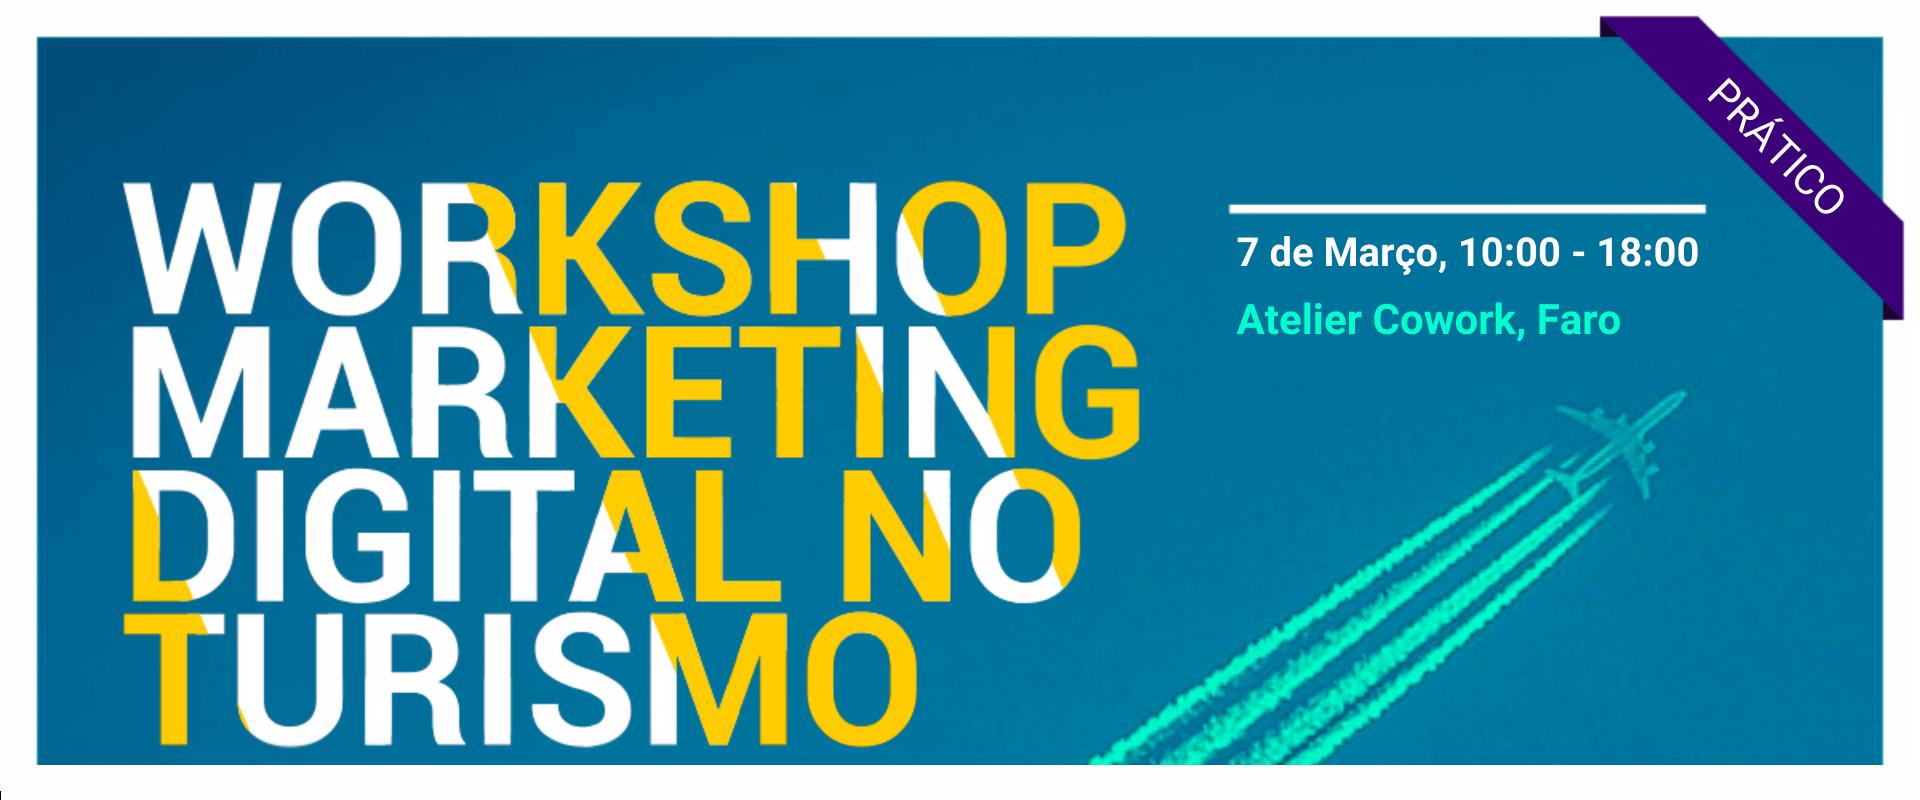 Workshop Prático Marketing Digital no Turismo